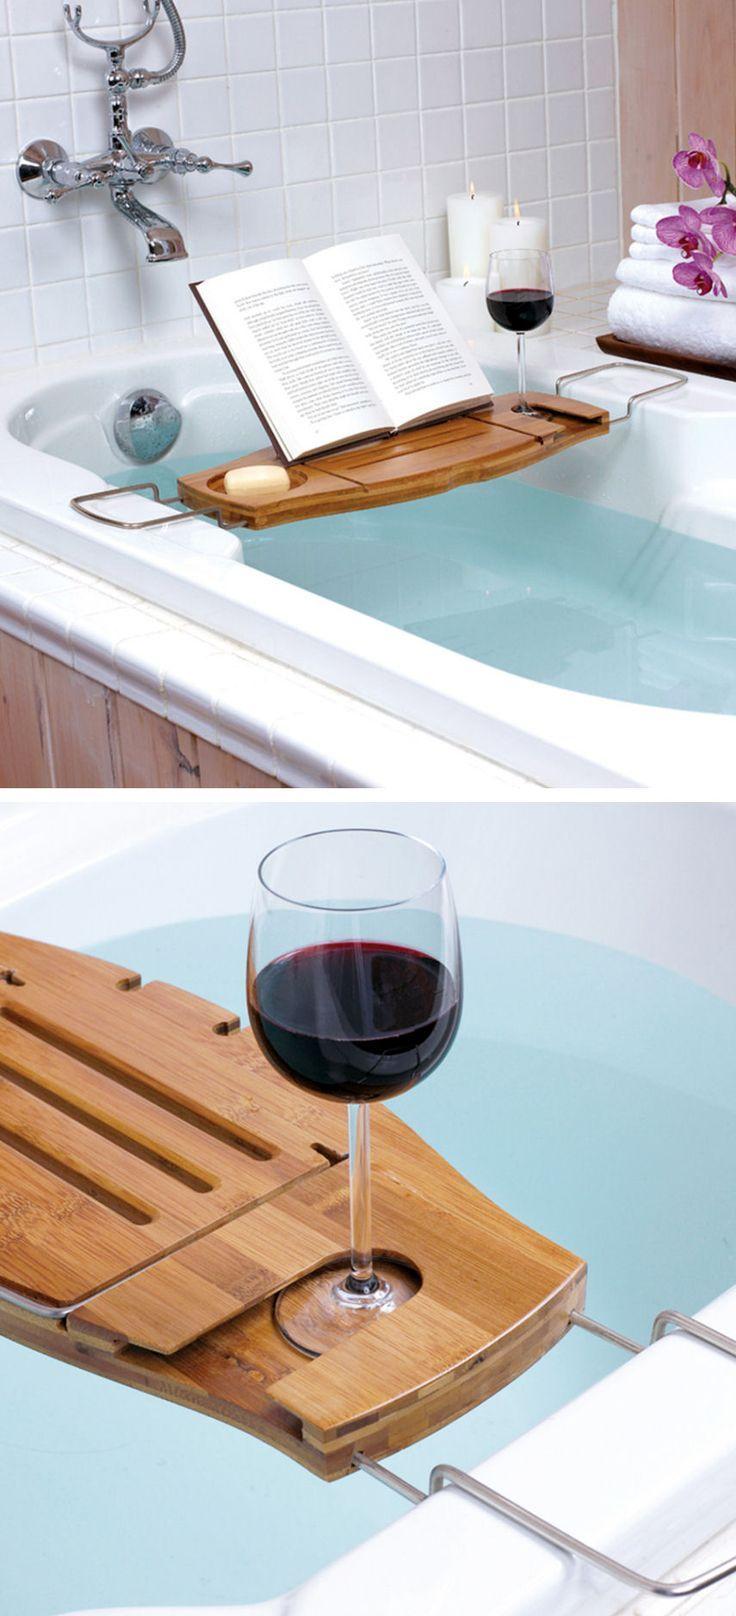 Bath Caddy with Wine Glass Holder // L.O.V.E. | modern architecture ...